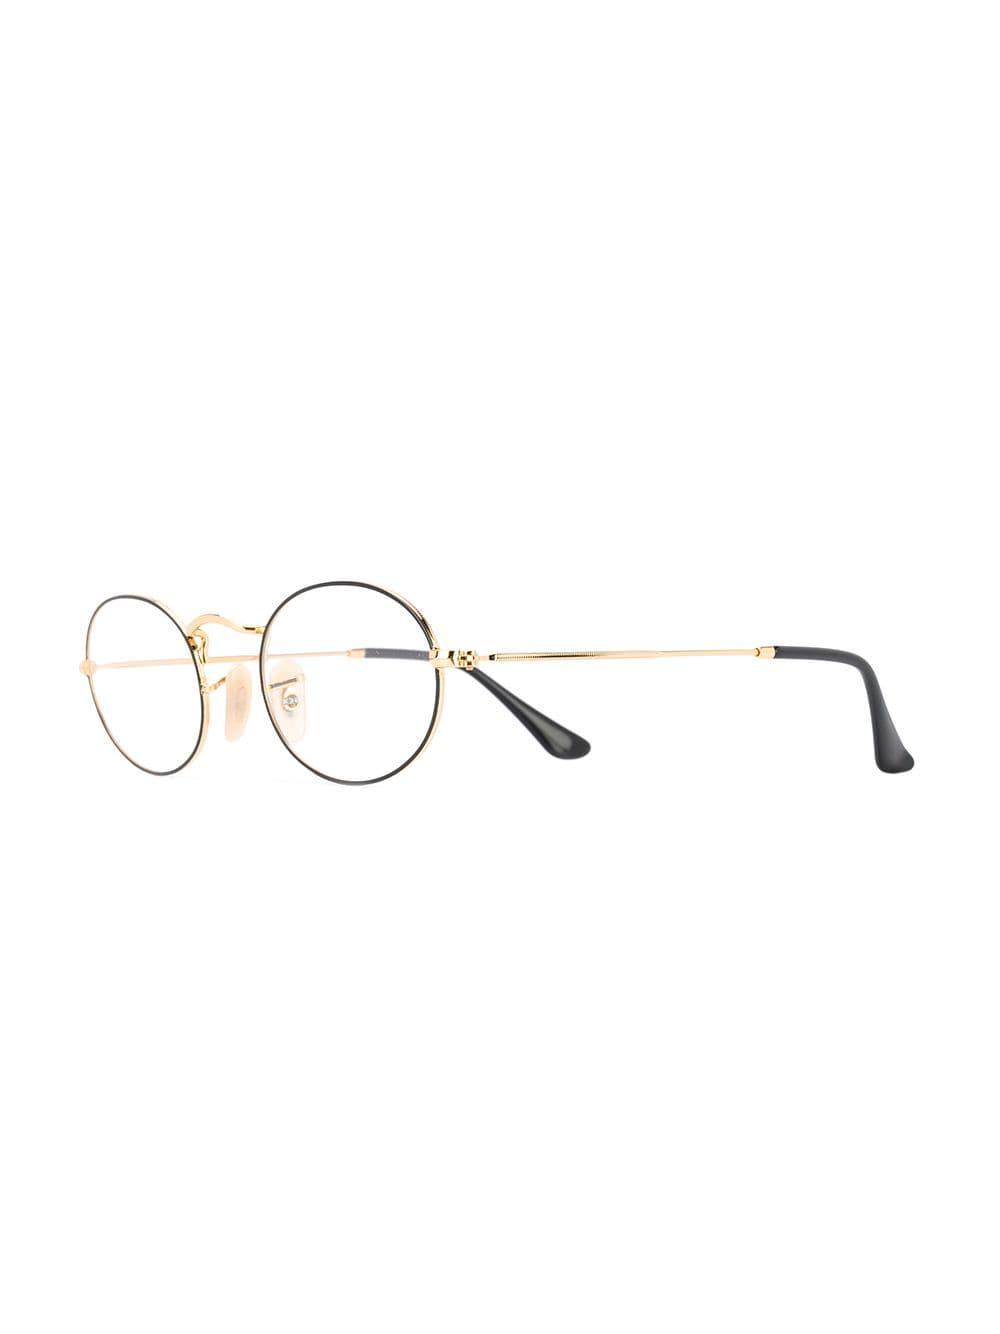 1e8d7c0880 Ray-Ban - Black Round Frame Glasses - Lyst. View fullscreen